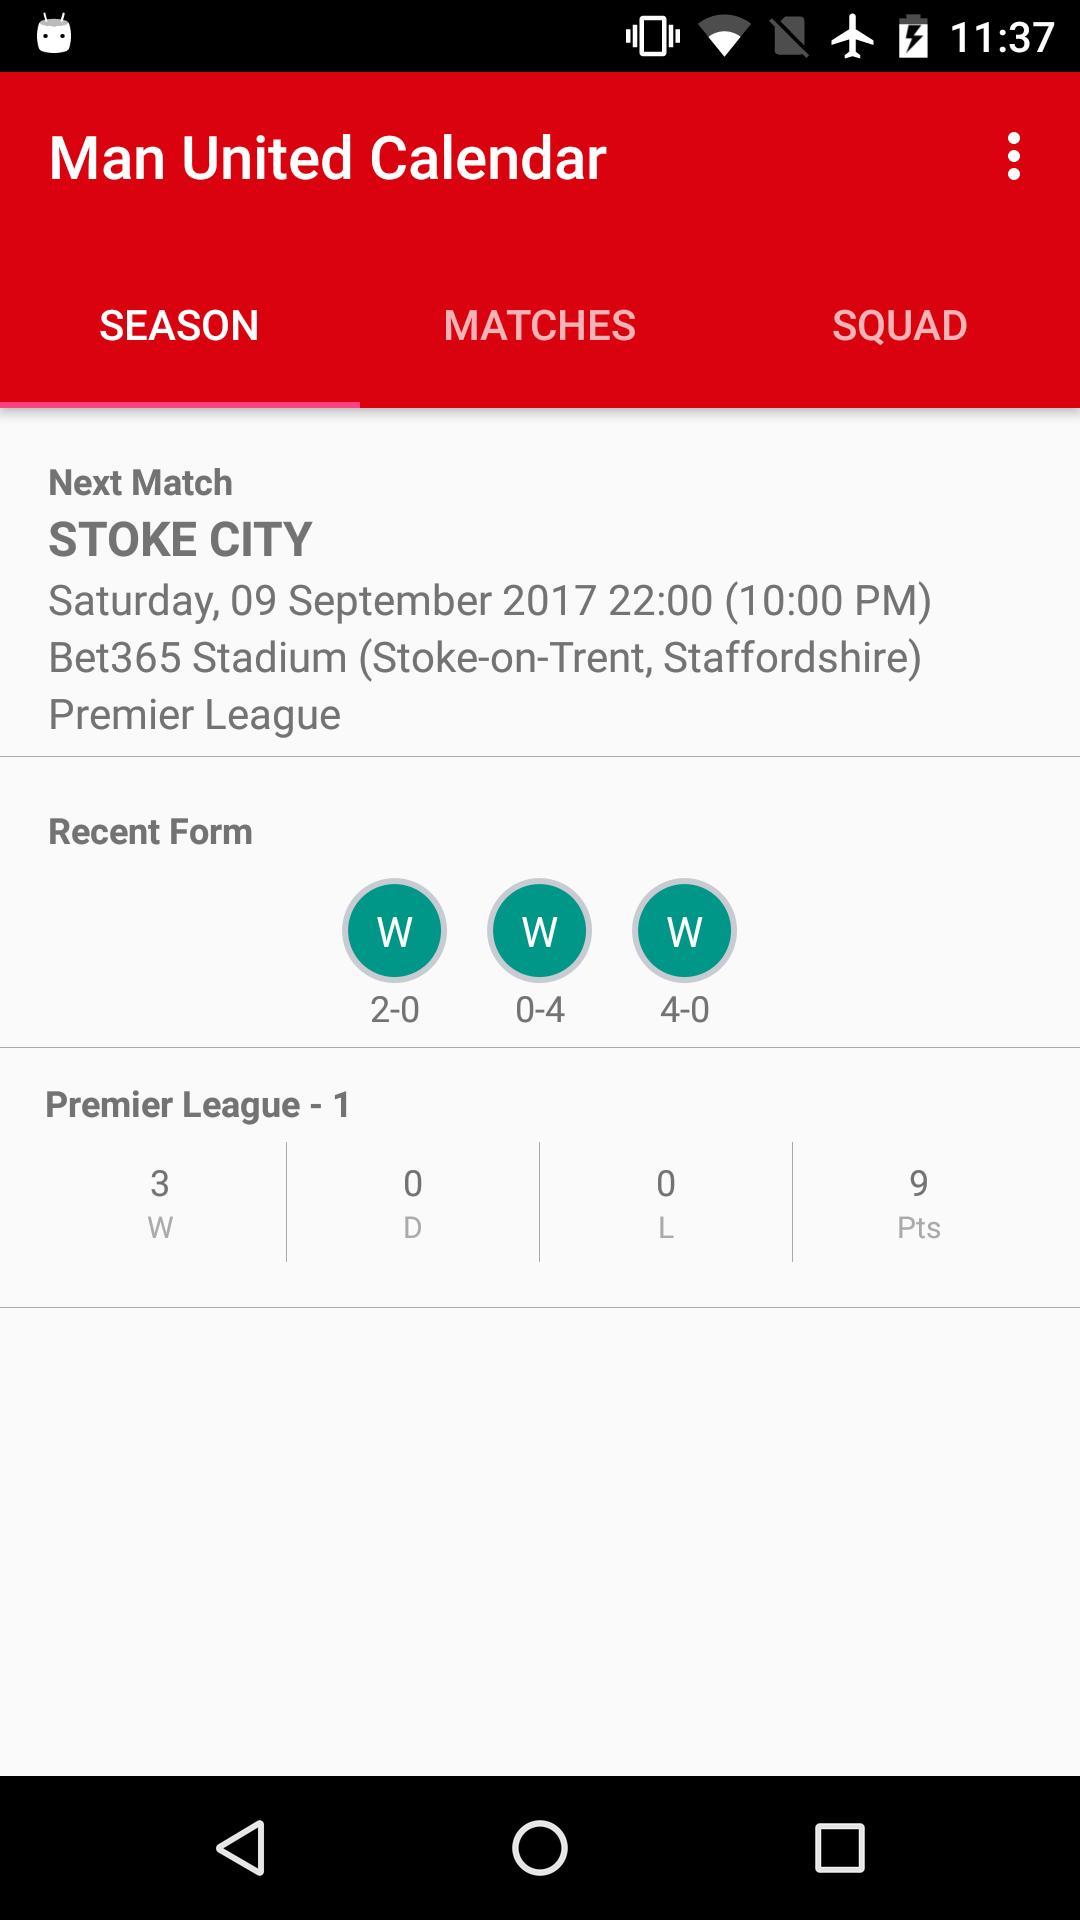 Manchester United Calendario.Man United Calendario For Android Apk Download